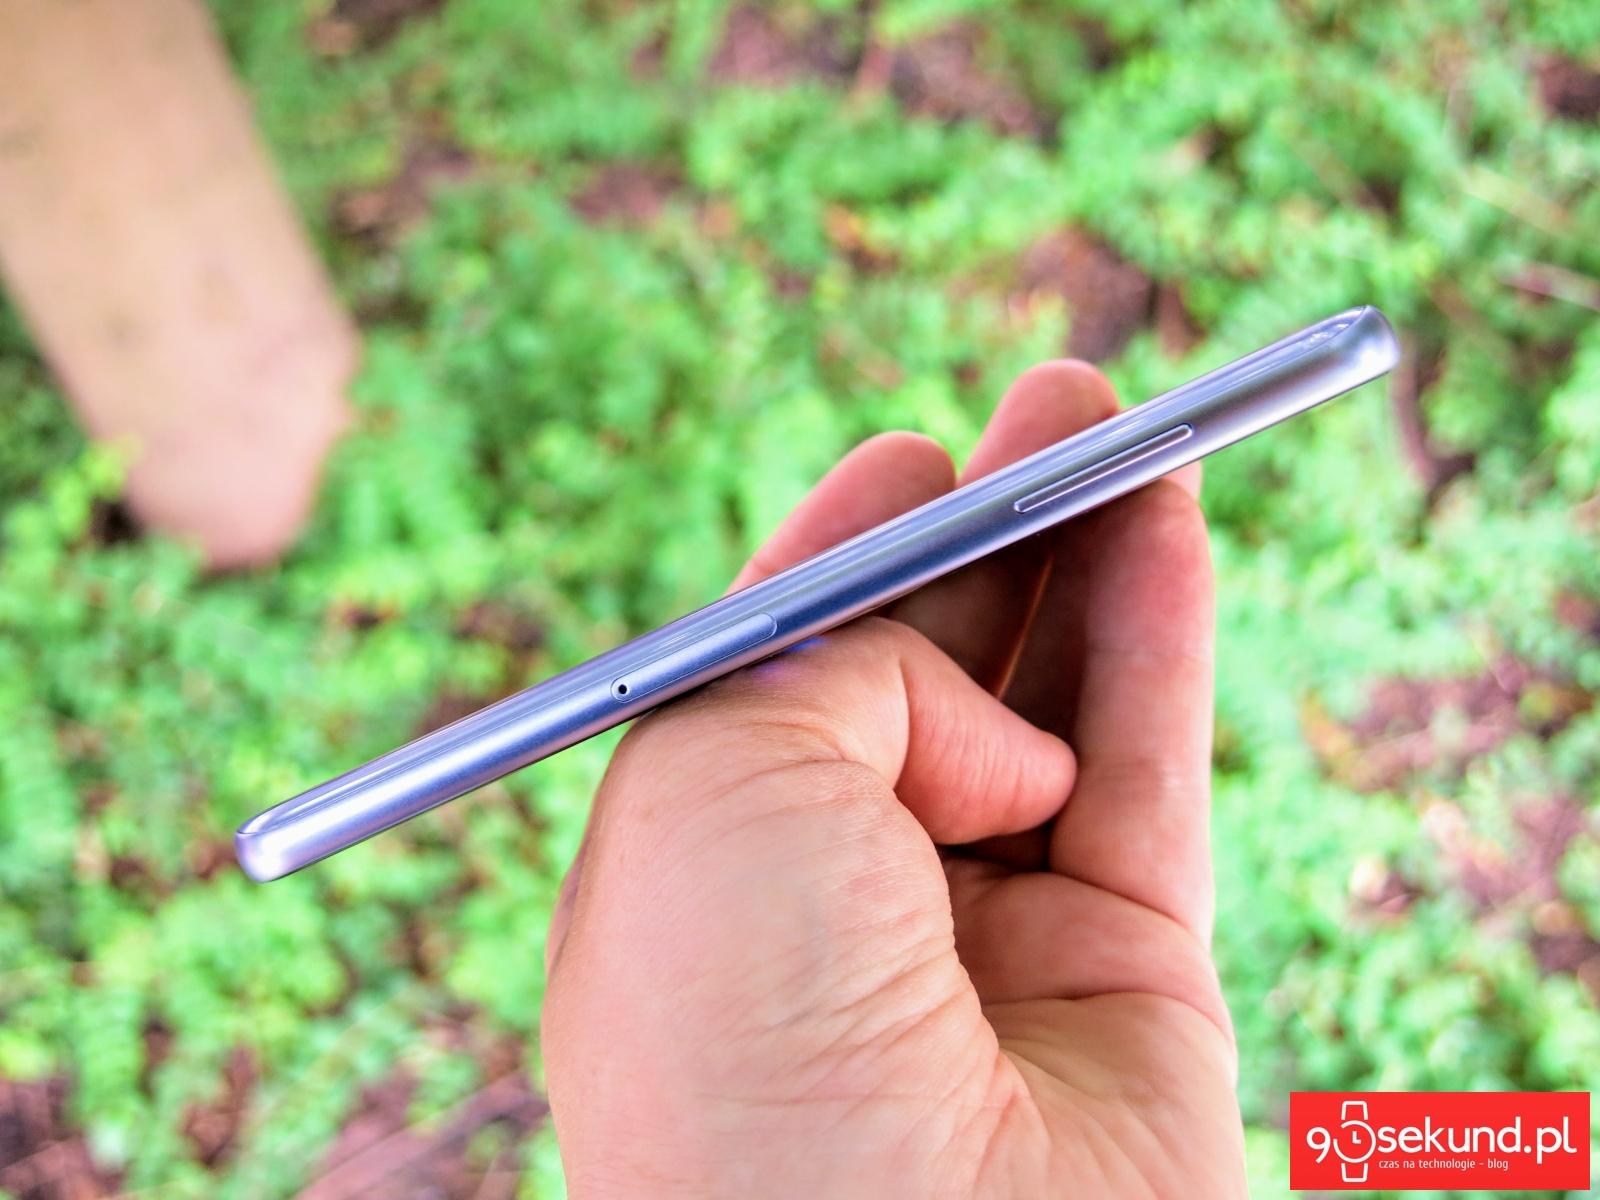 Recenzja Samsunga Galaxy A8 (SM-A530F) - 90sekund.pl